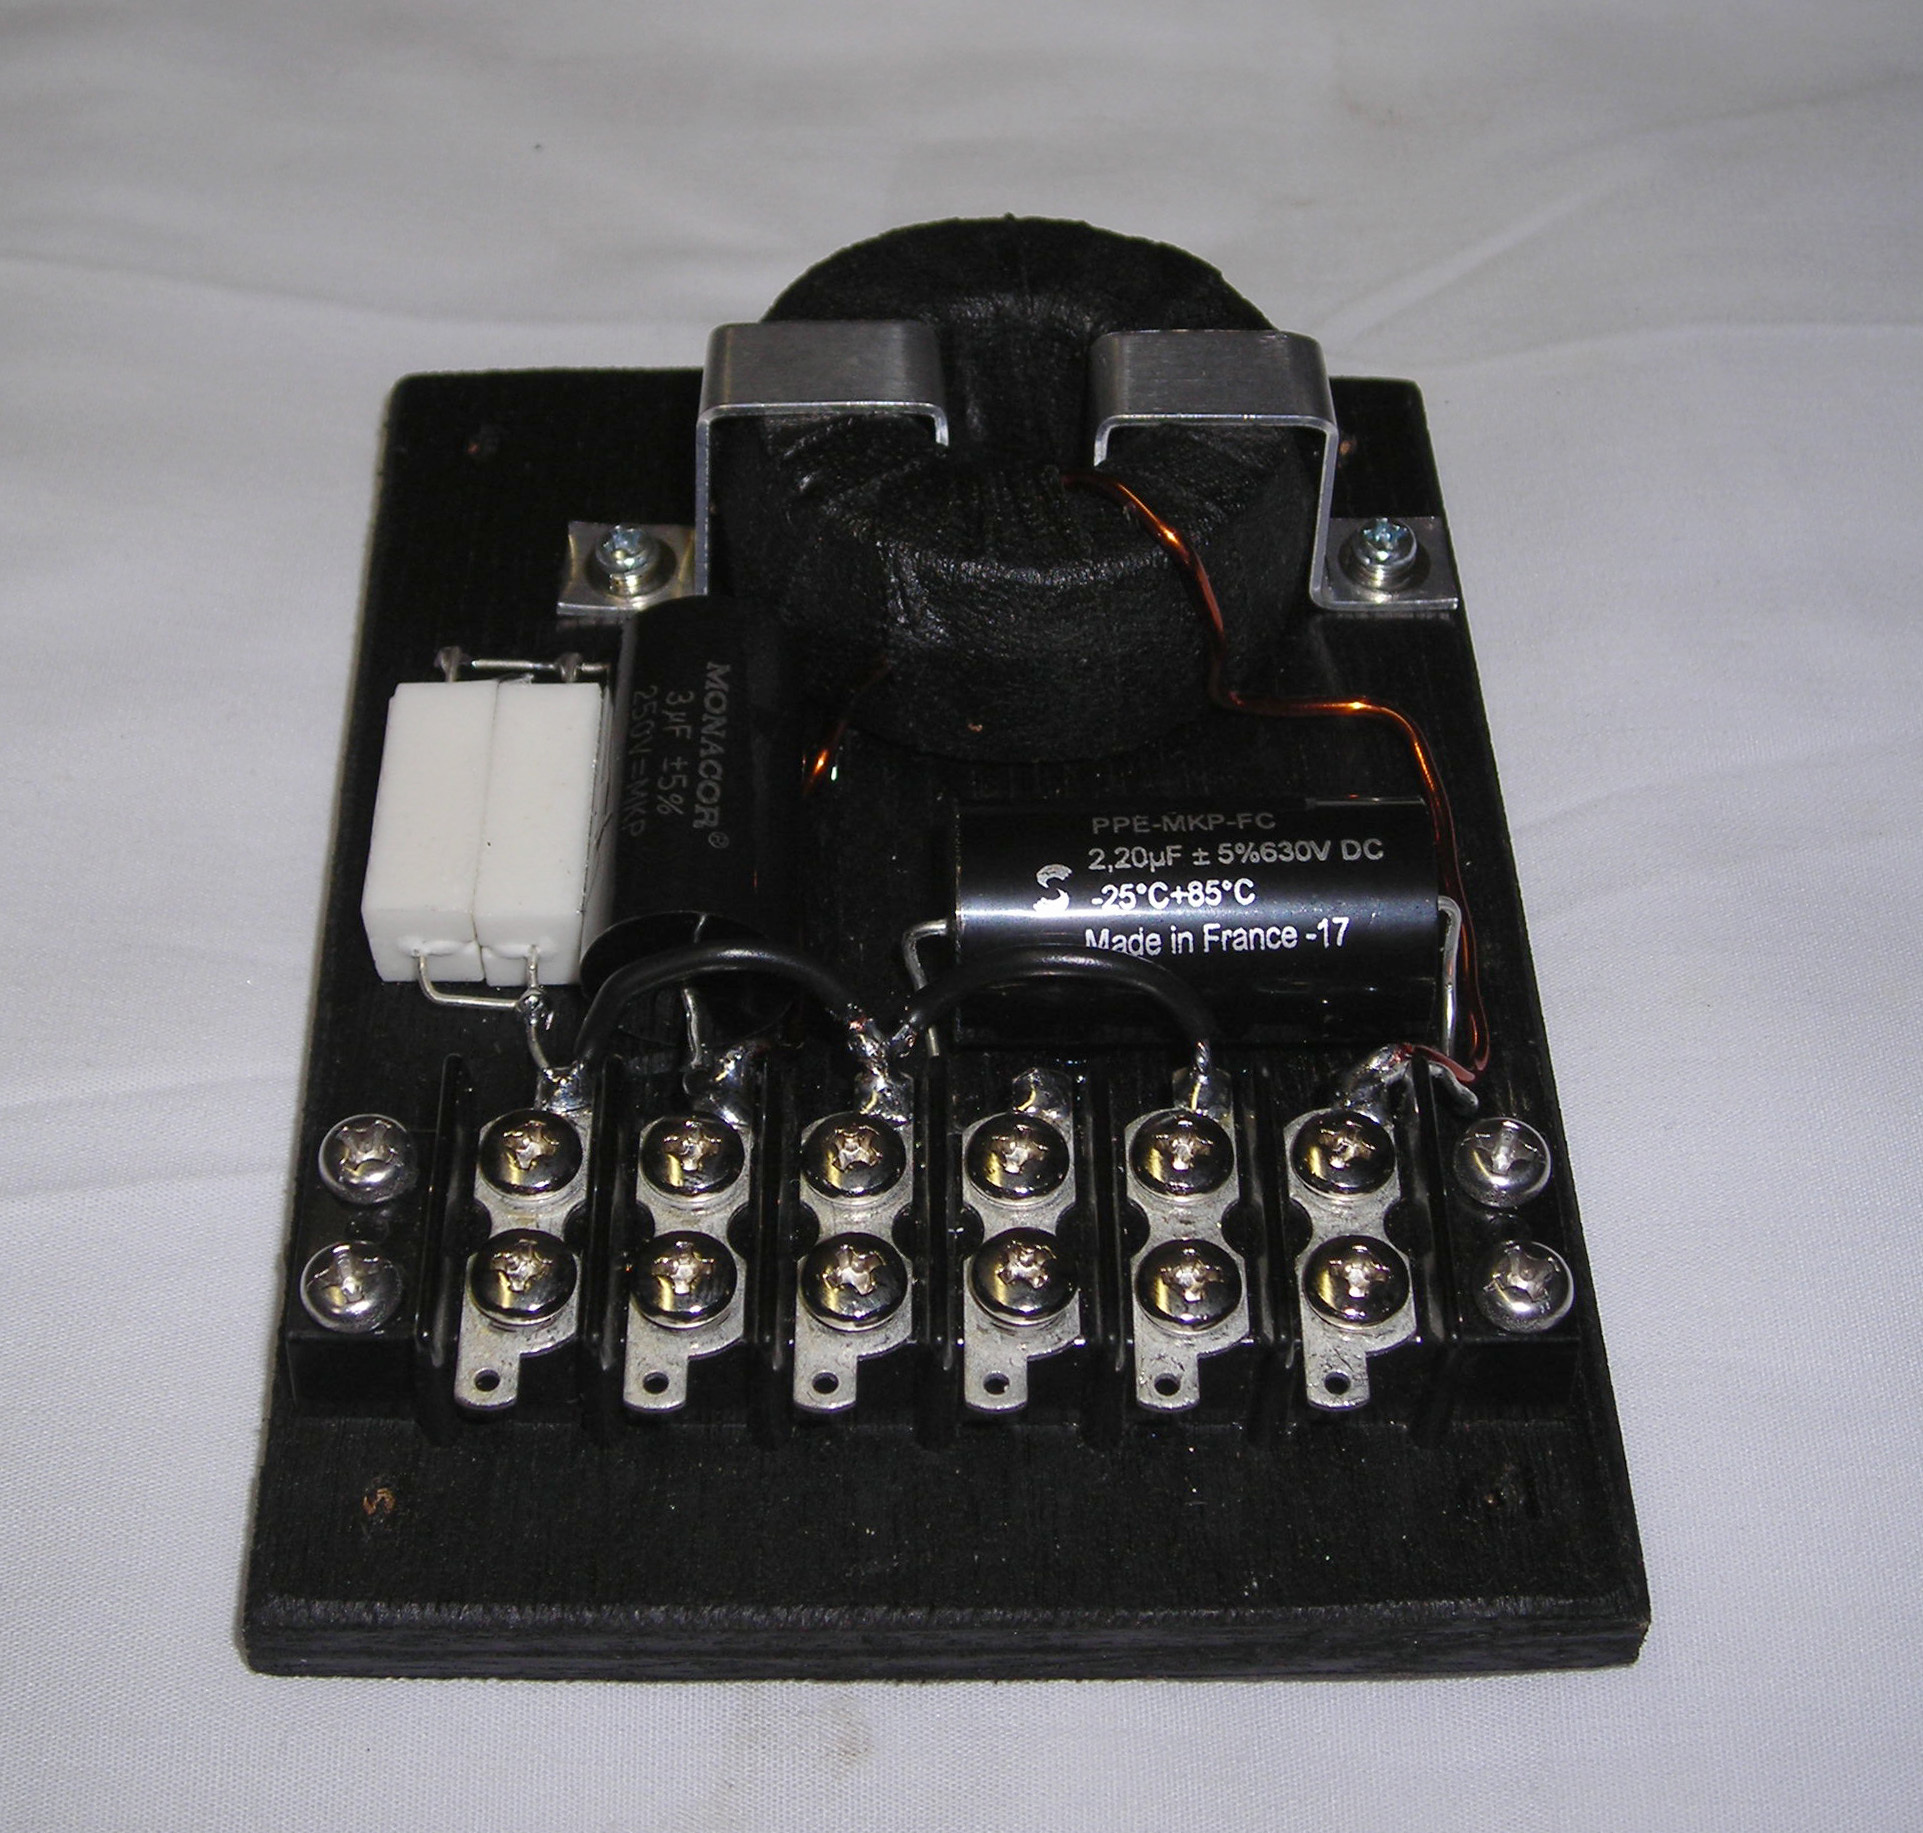 LC-5000:6